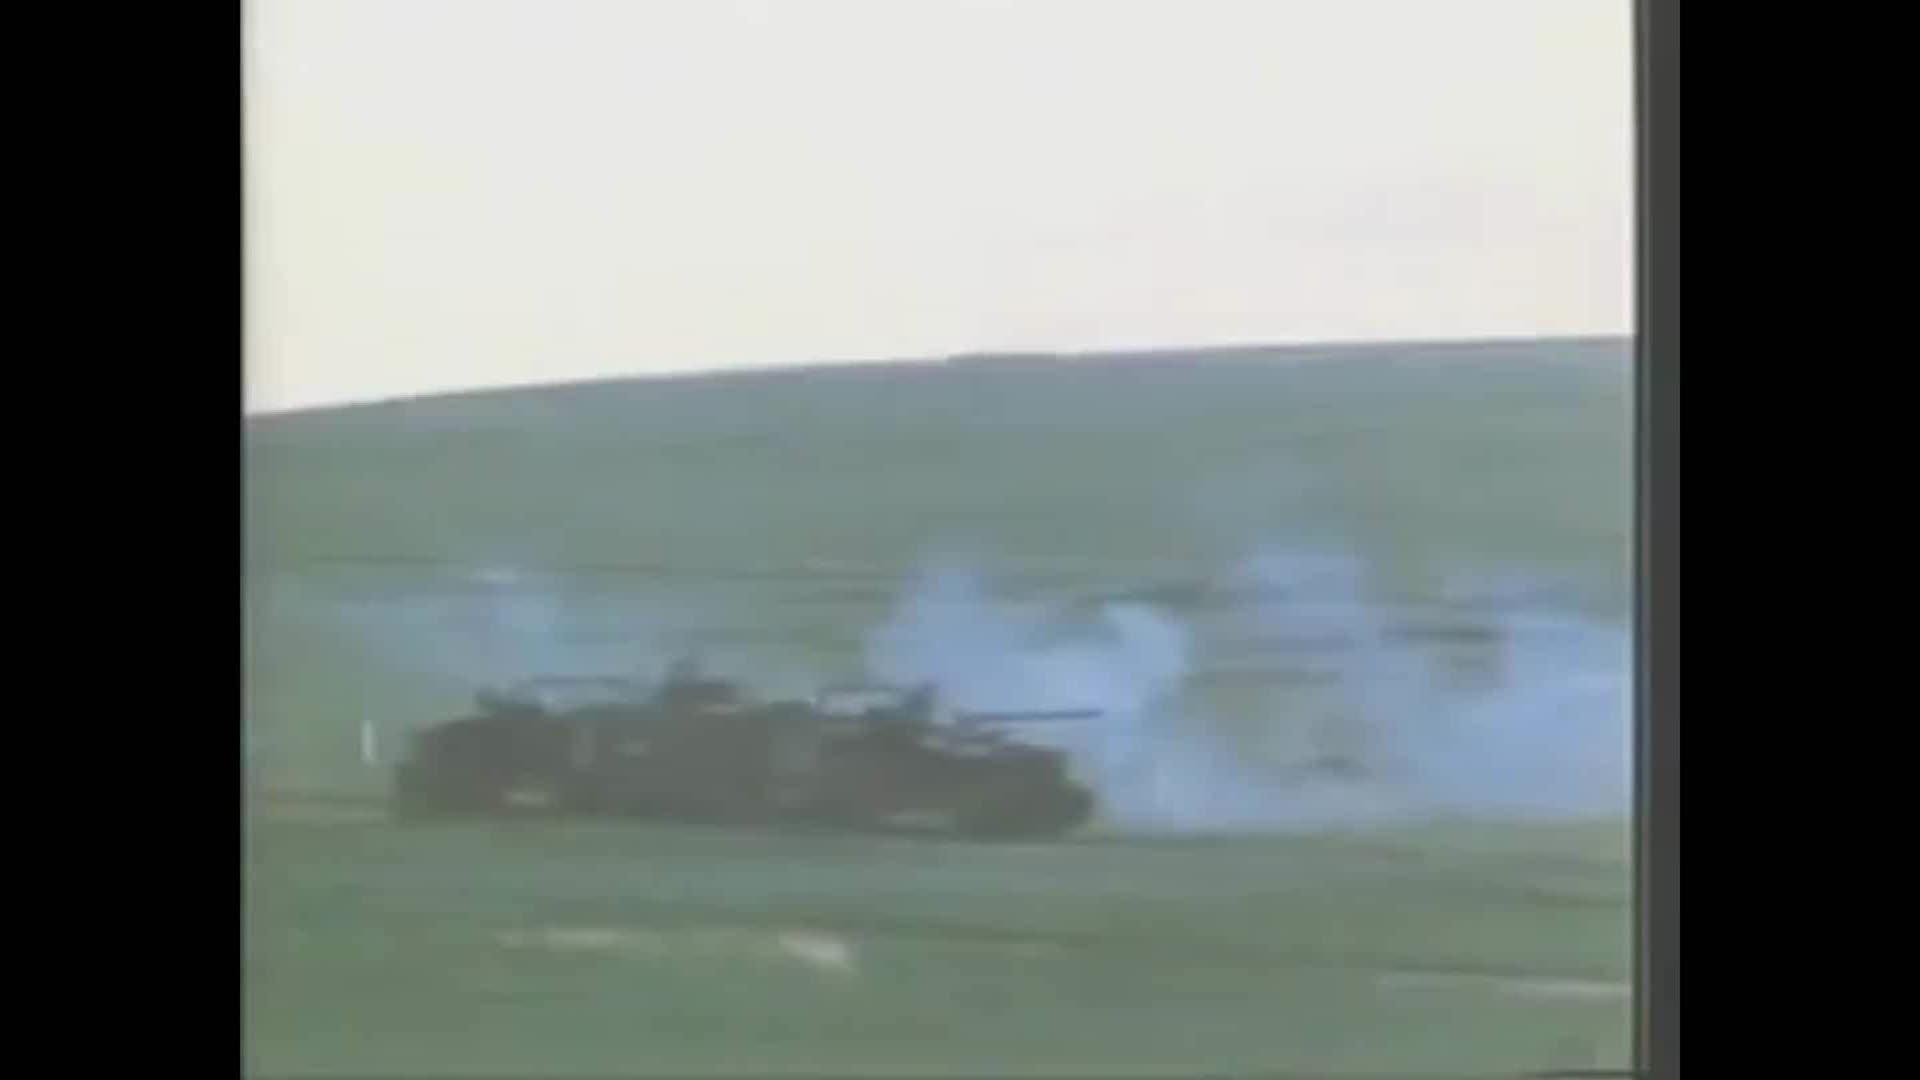 militarygfys, Bonus Soviet battle train (reddit) GIFs